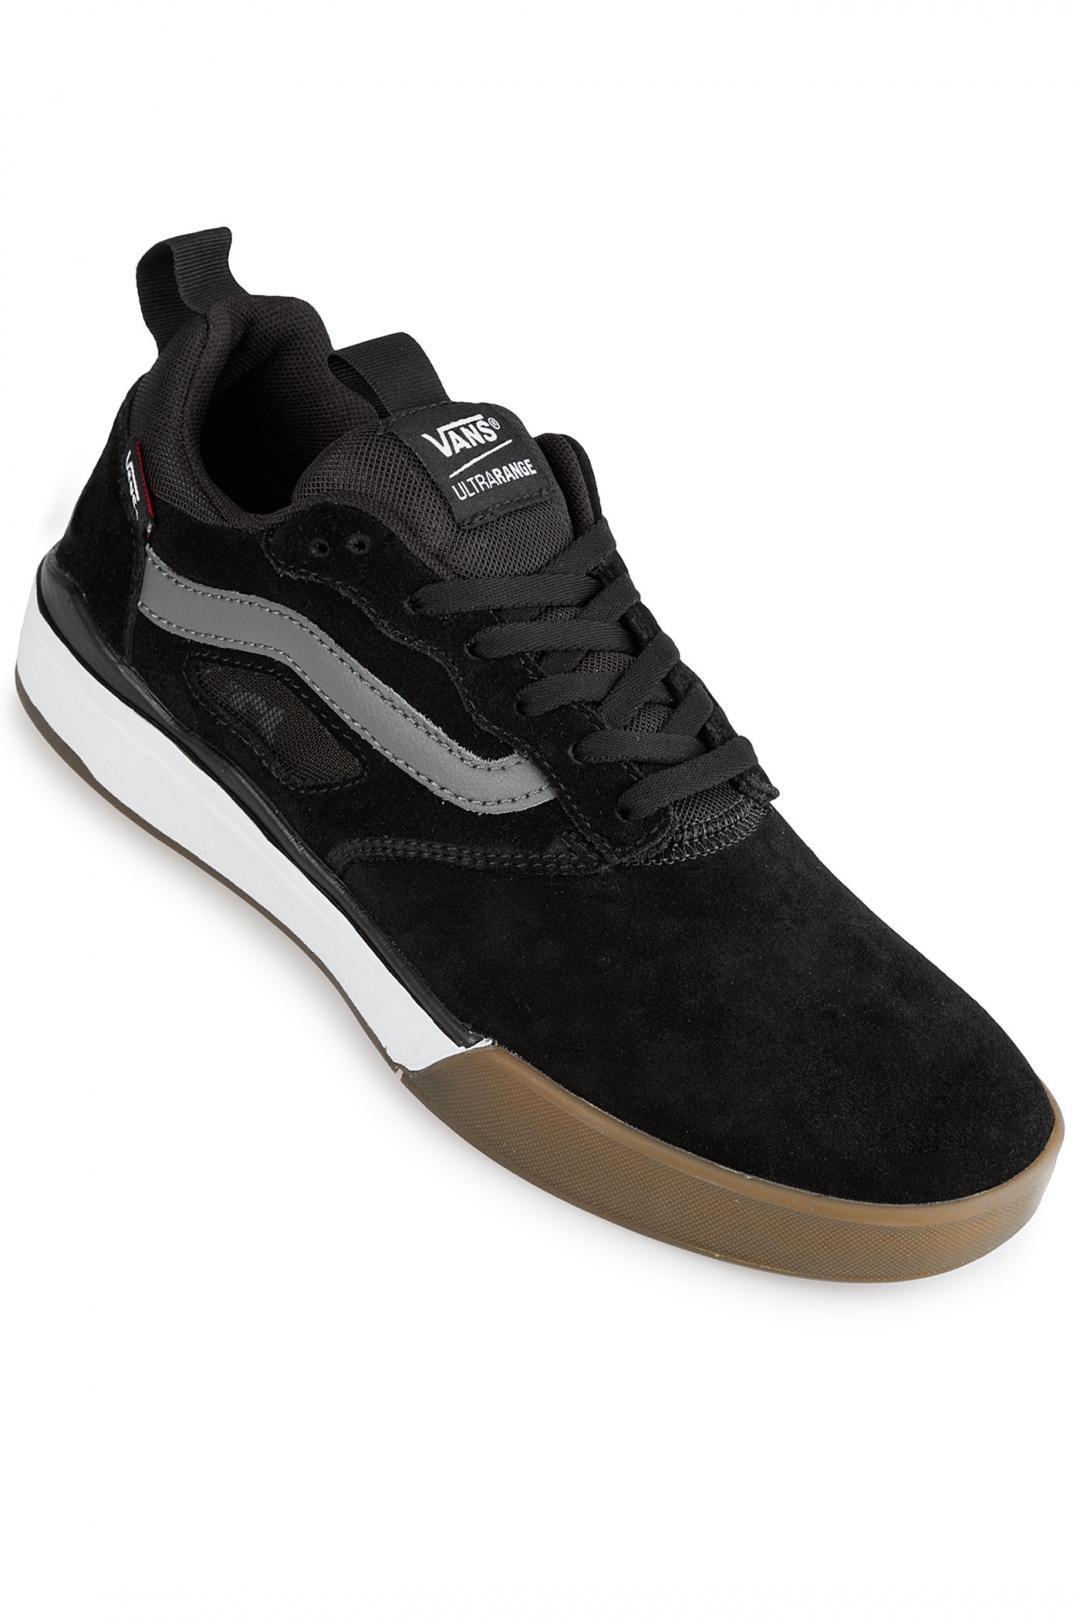 Uomo Vans Ultrarange Pro black gum white   Sneakers low top